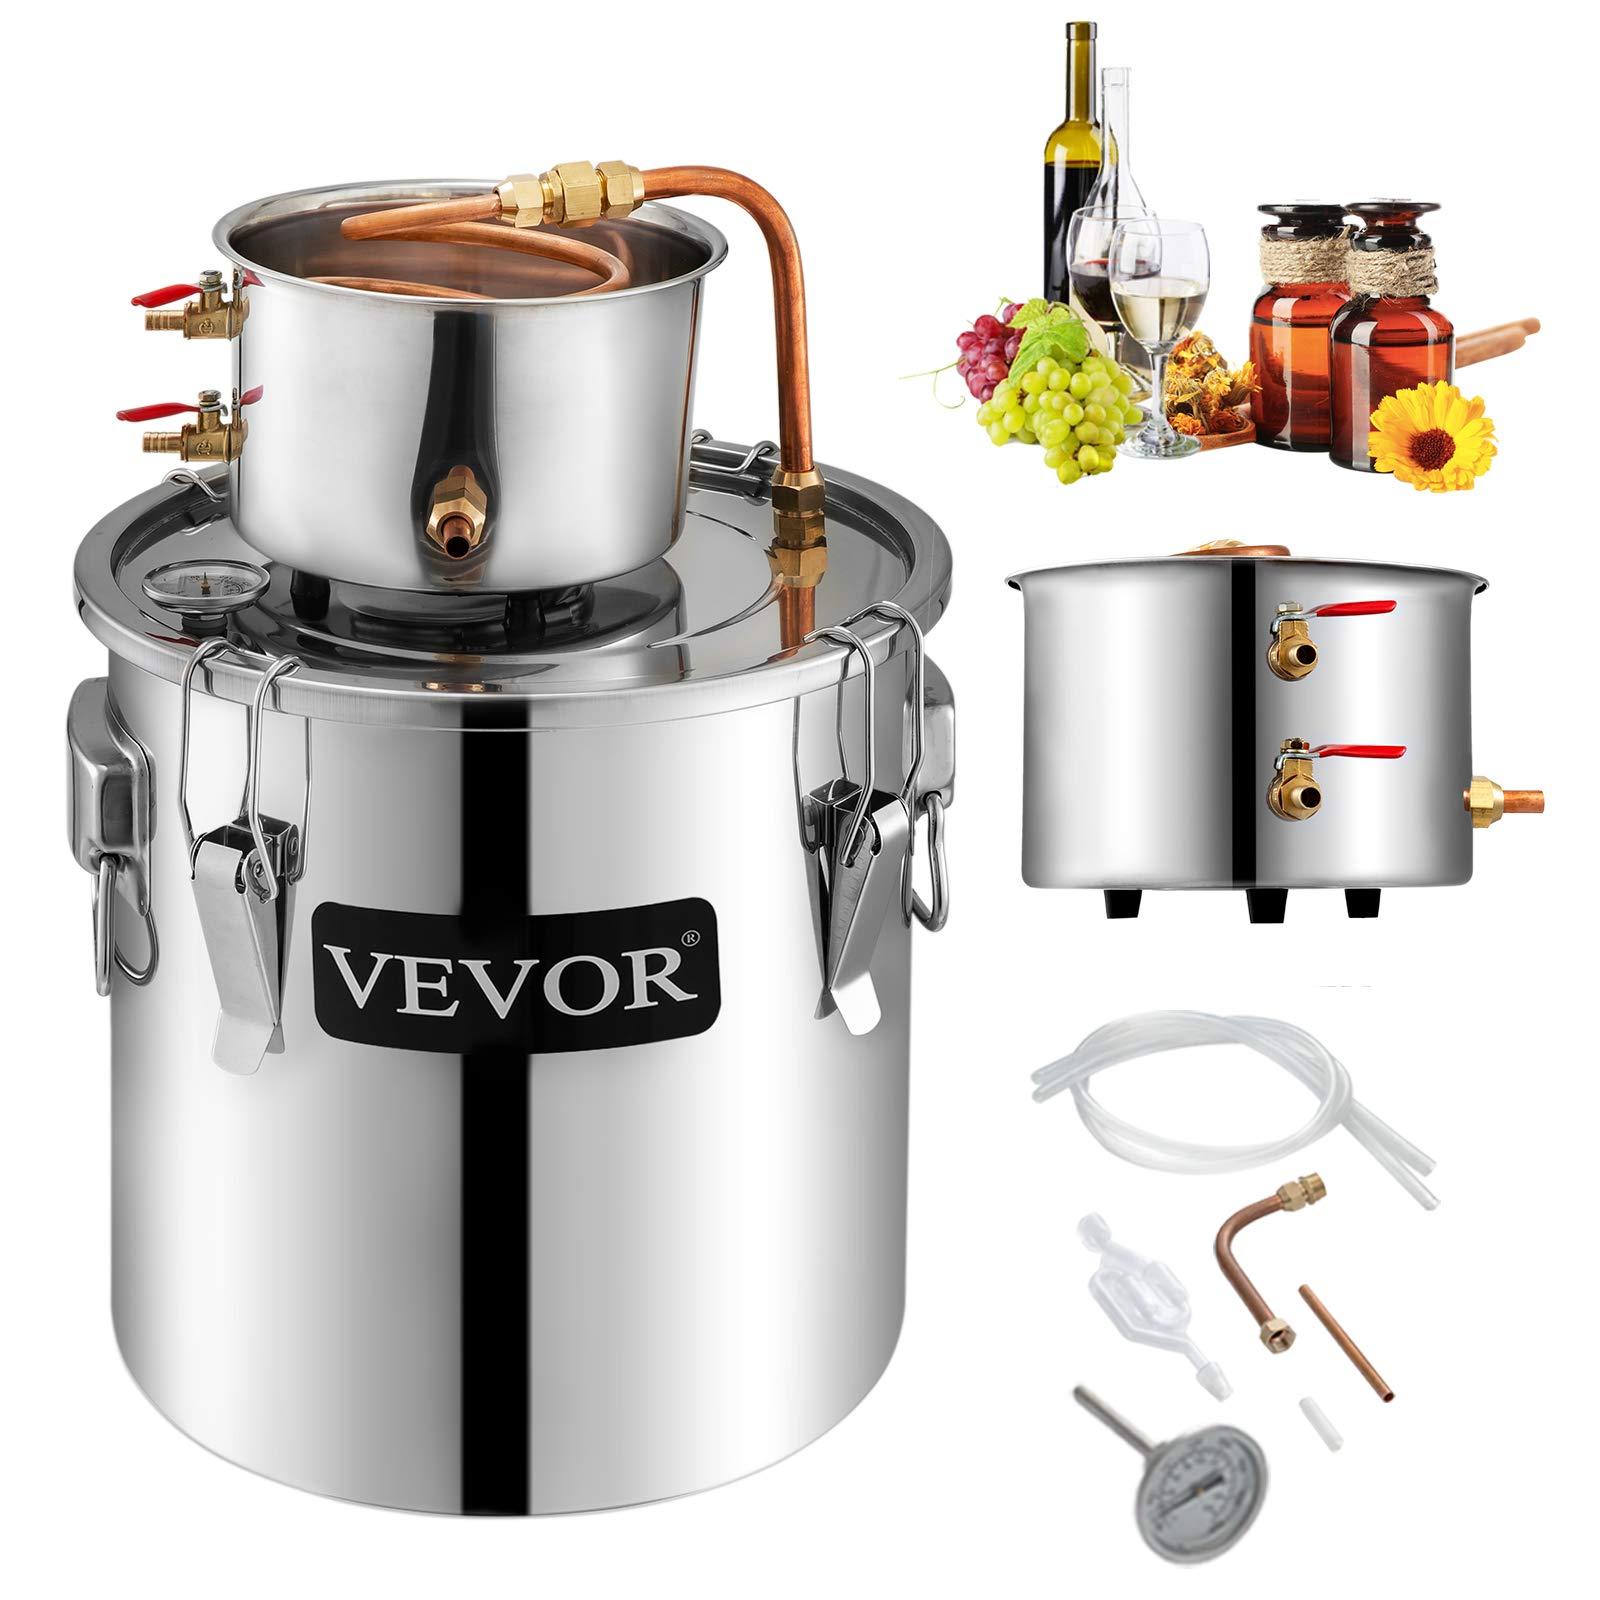 VBENLEM Moonshine Still 5 Gal/ 21 Liter Stainless Steel Water Alcohol Distiller Copper Tube Home Brewing Kit Build-in Thermometer for DIY Whisky Wine Brandy Spirits Brandy